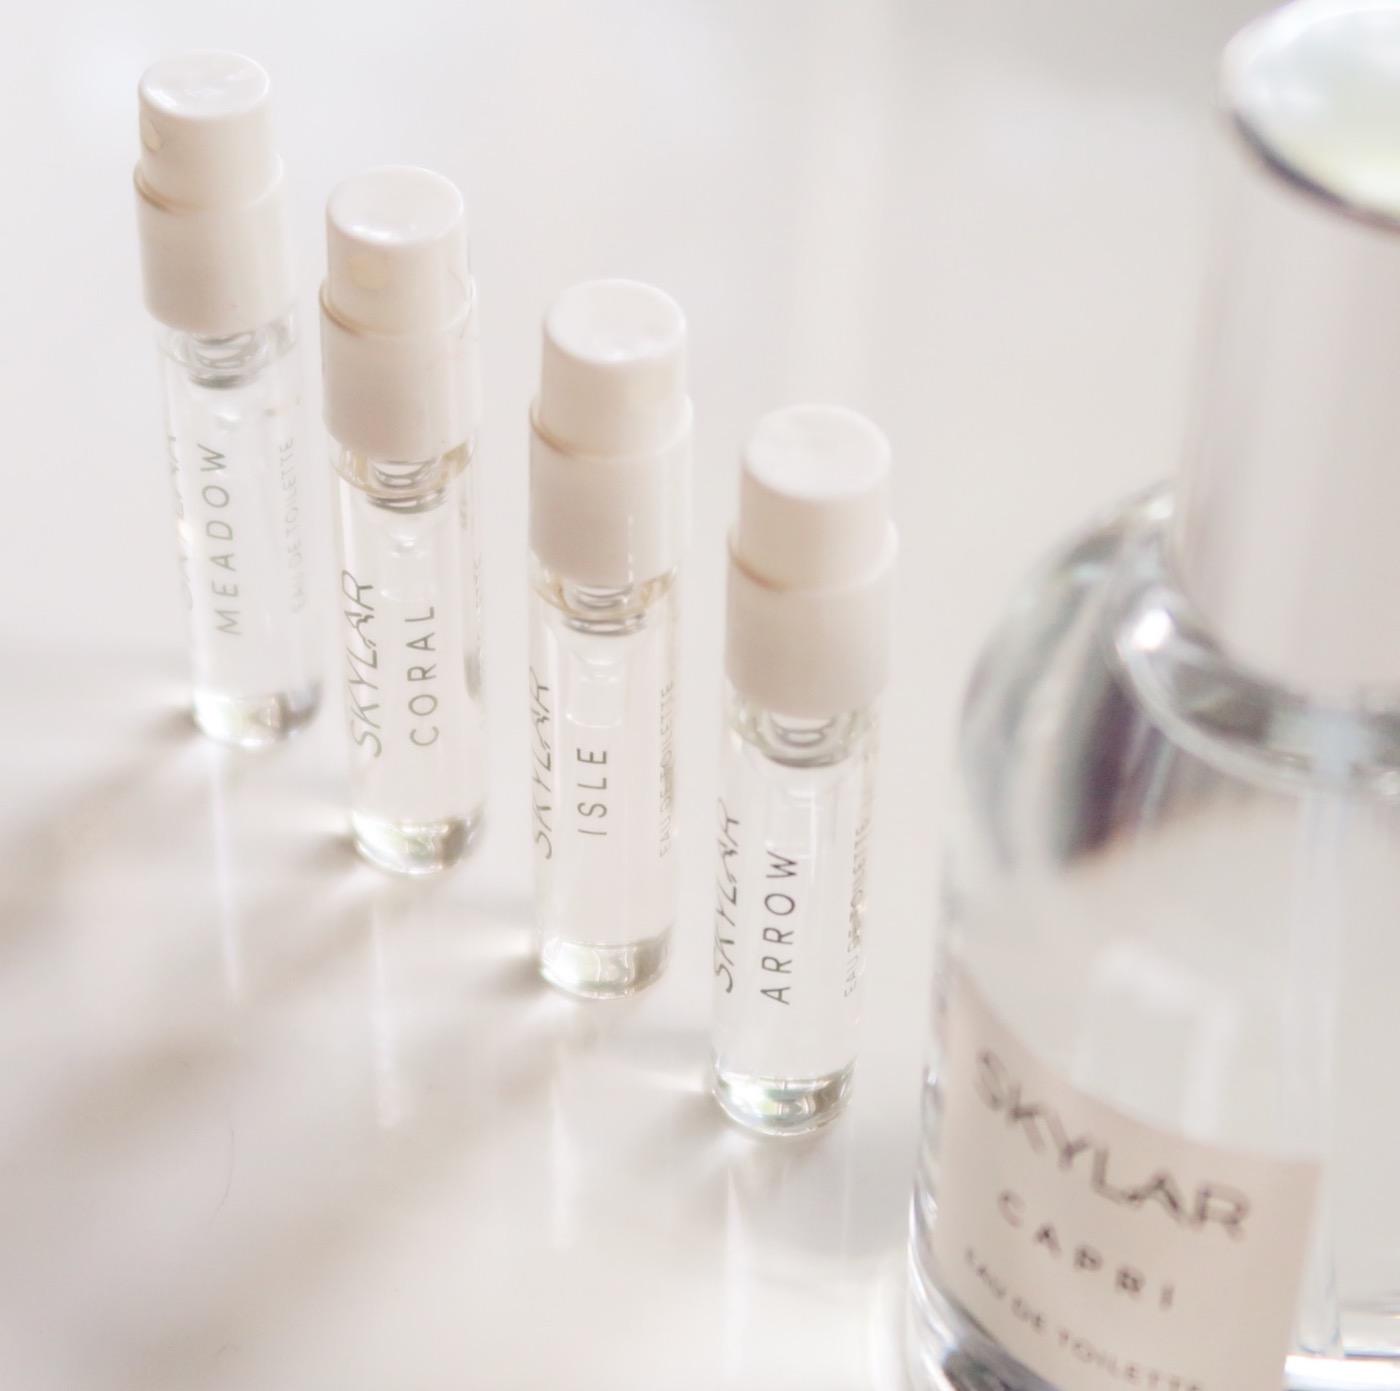 Skylar // a beautiful non-toxic perfume // www.thehiveblog.com